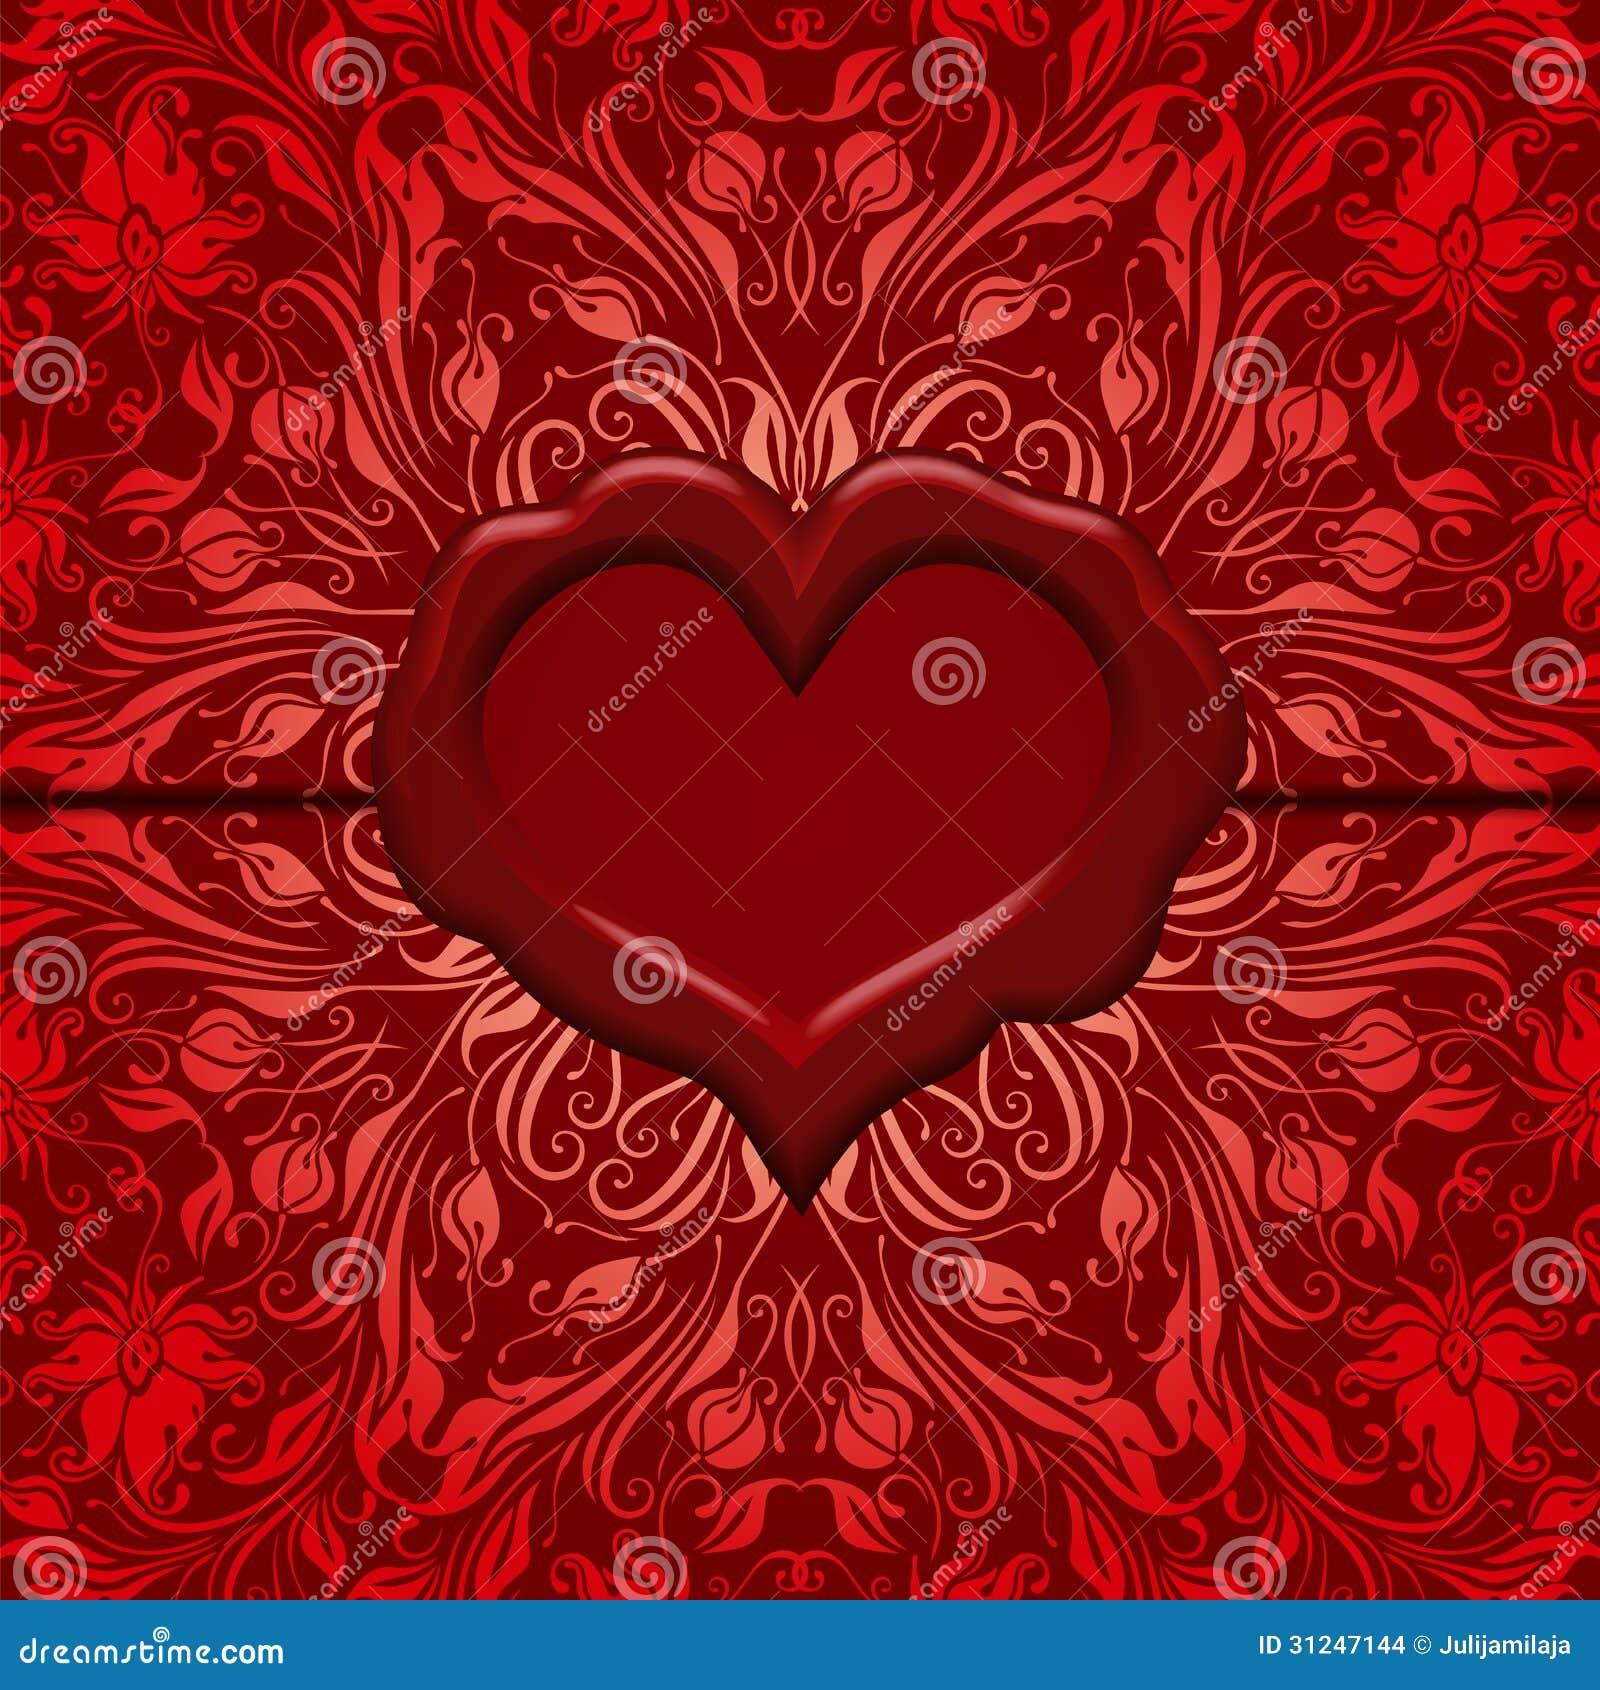 1300 x 1390 jpeg 533kB, Love Letter Background Template Ornate love ...